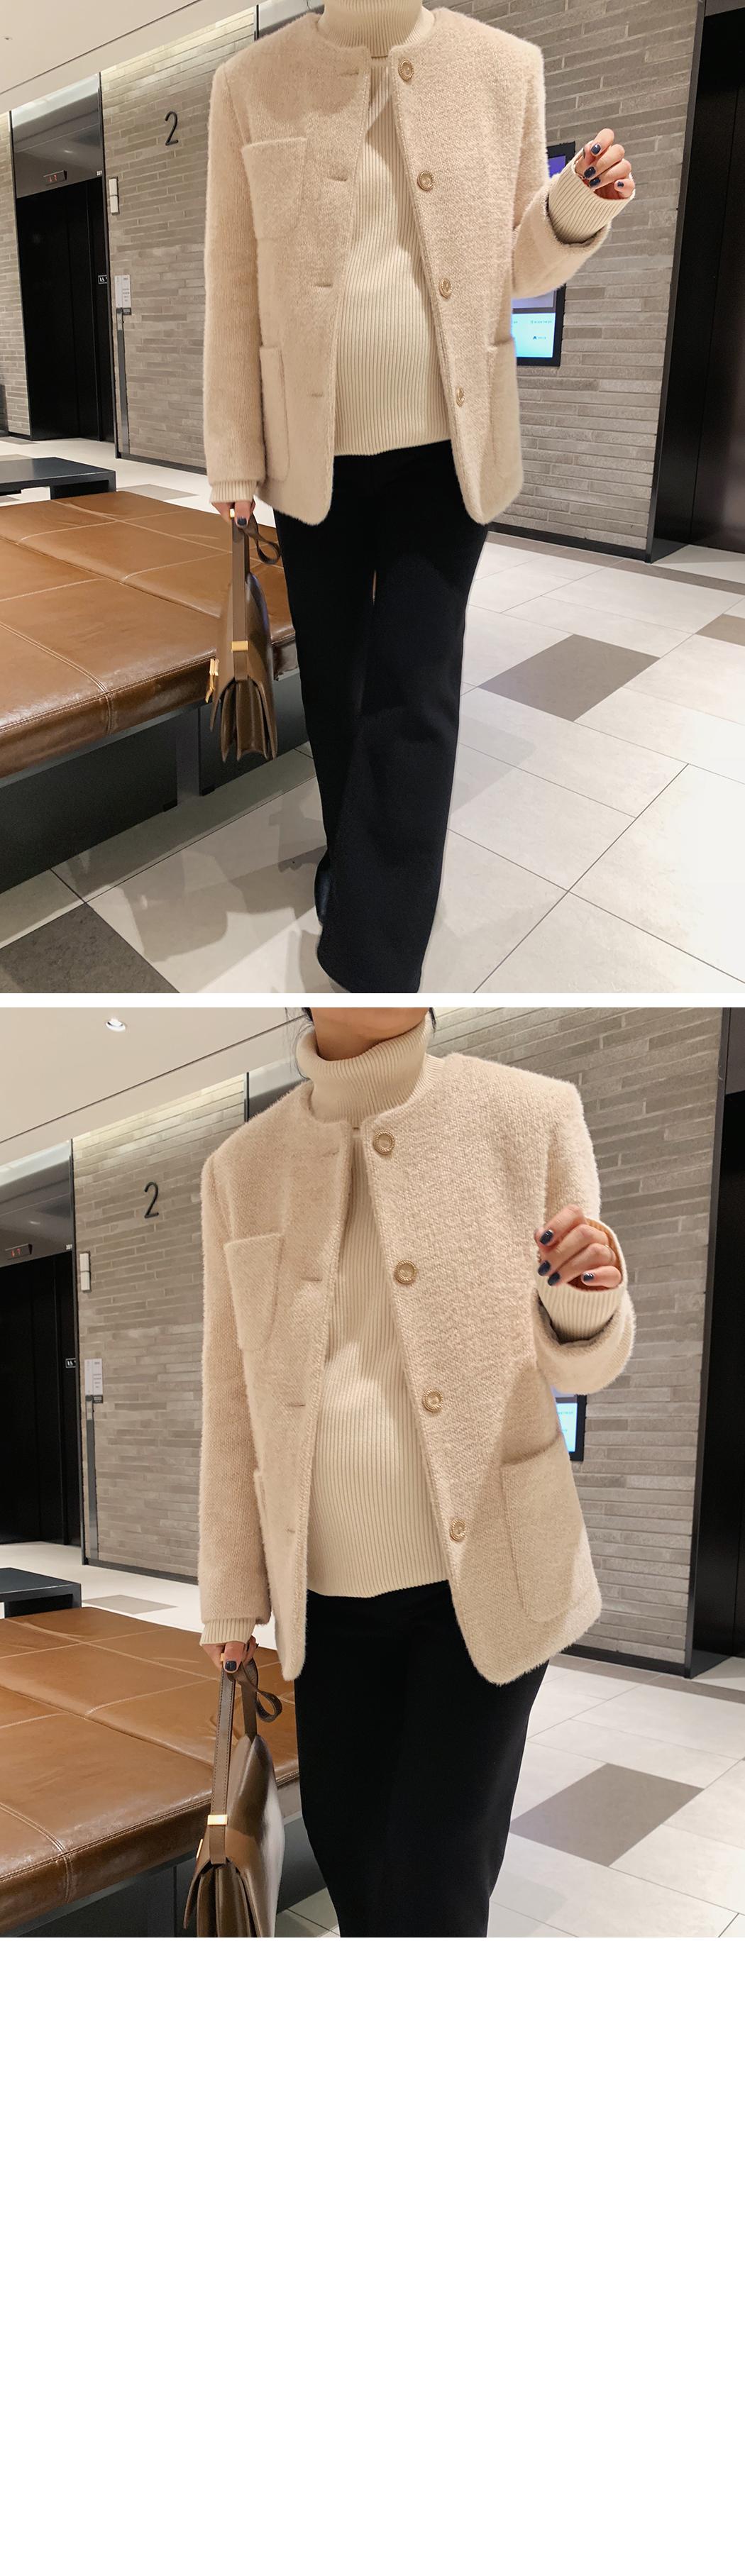 Hairy quilted tweed jacket